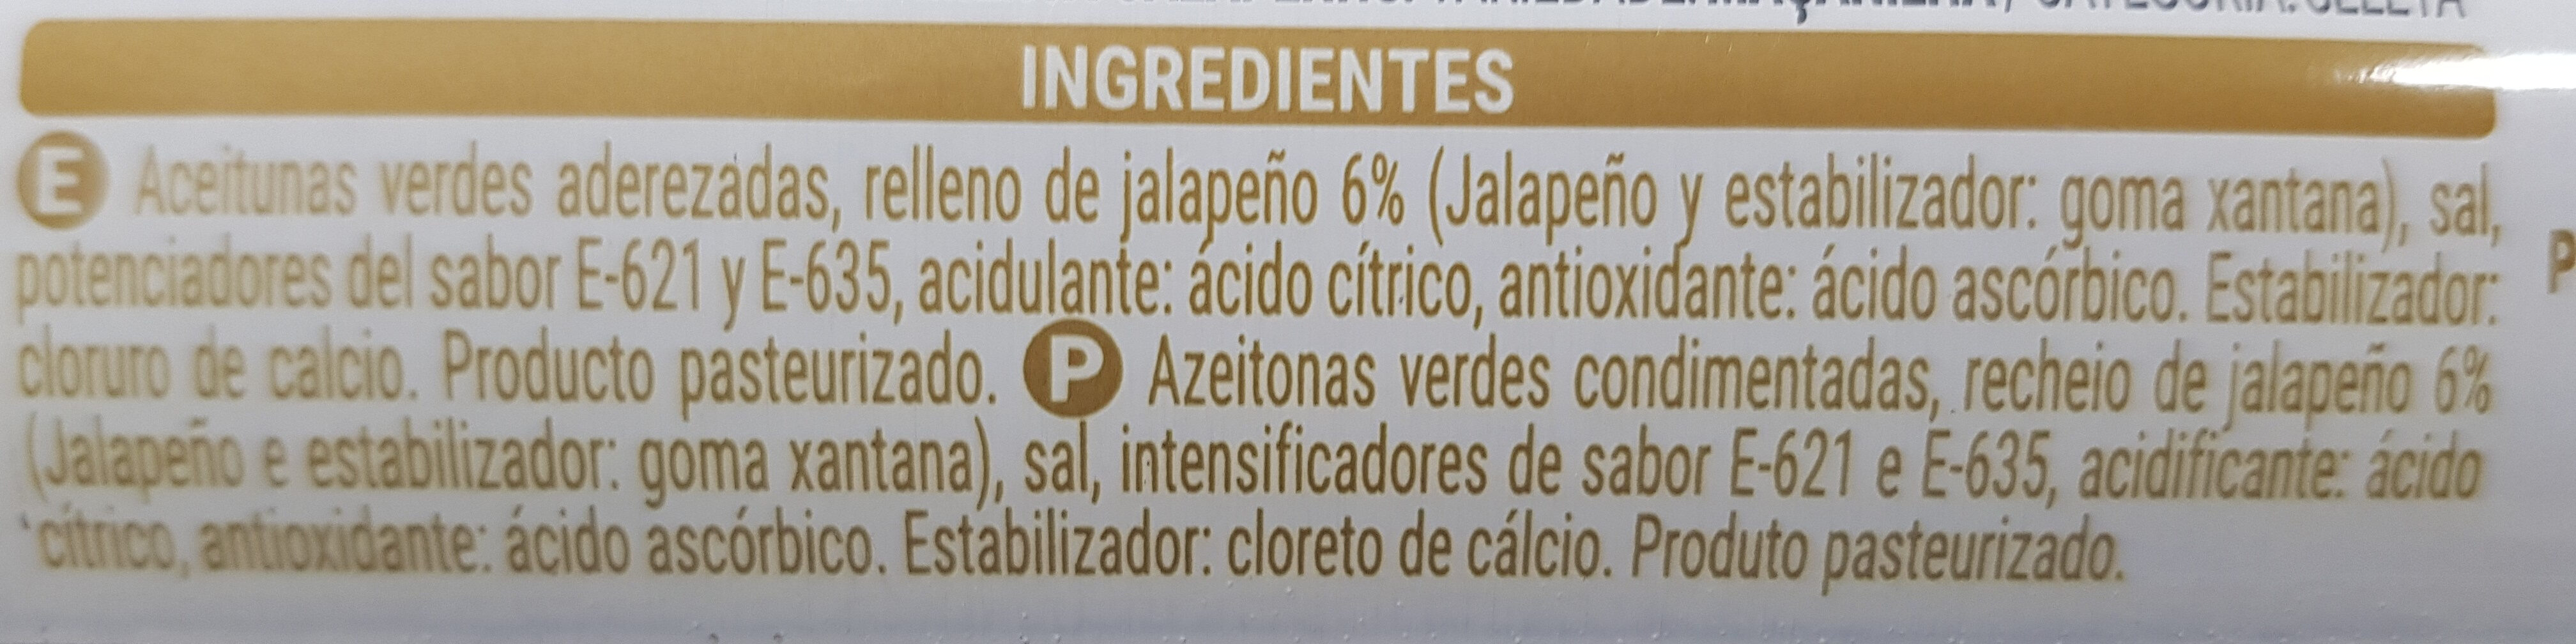 Aceitunas Verdes Rellenas de Jalapeño - Ingredientes